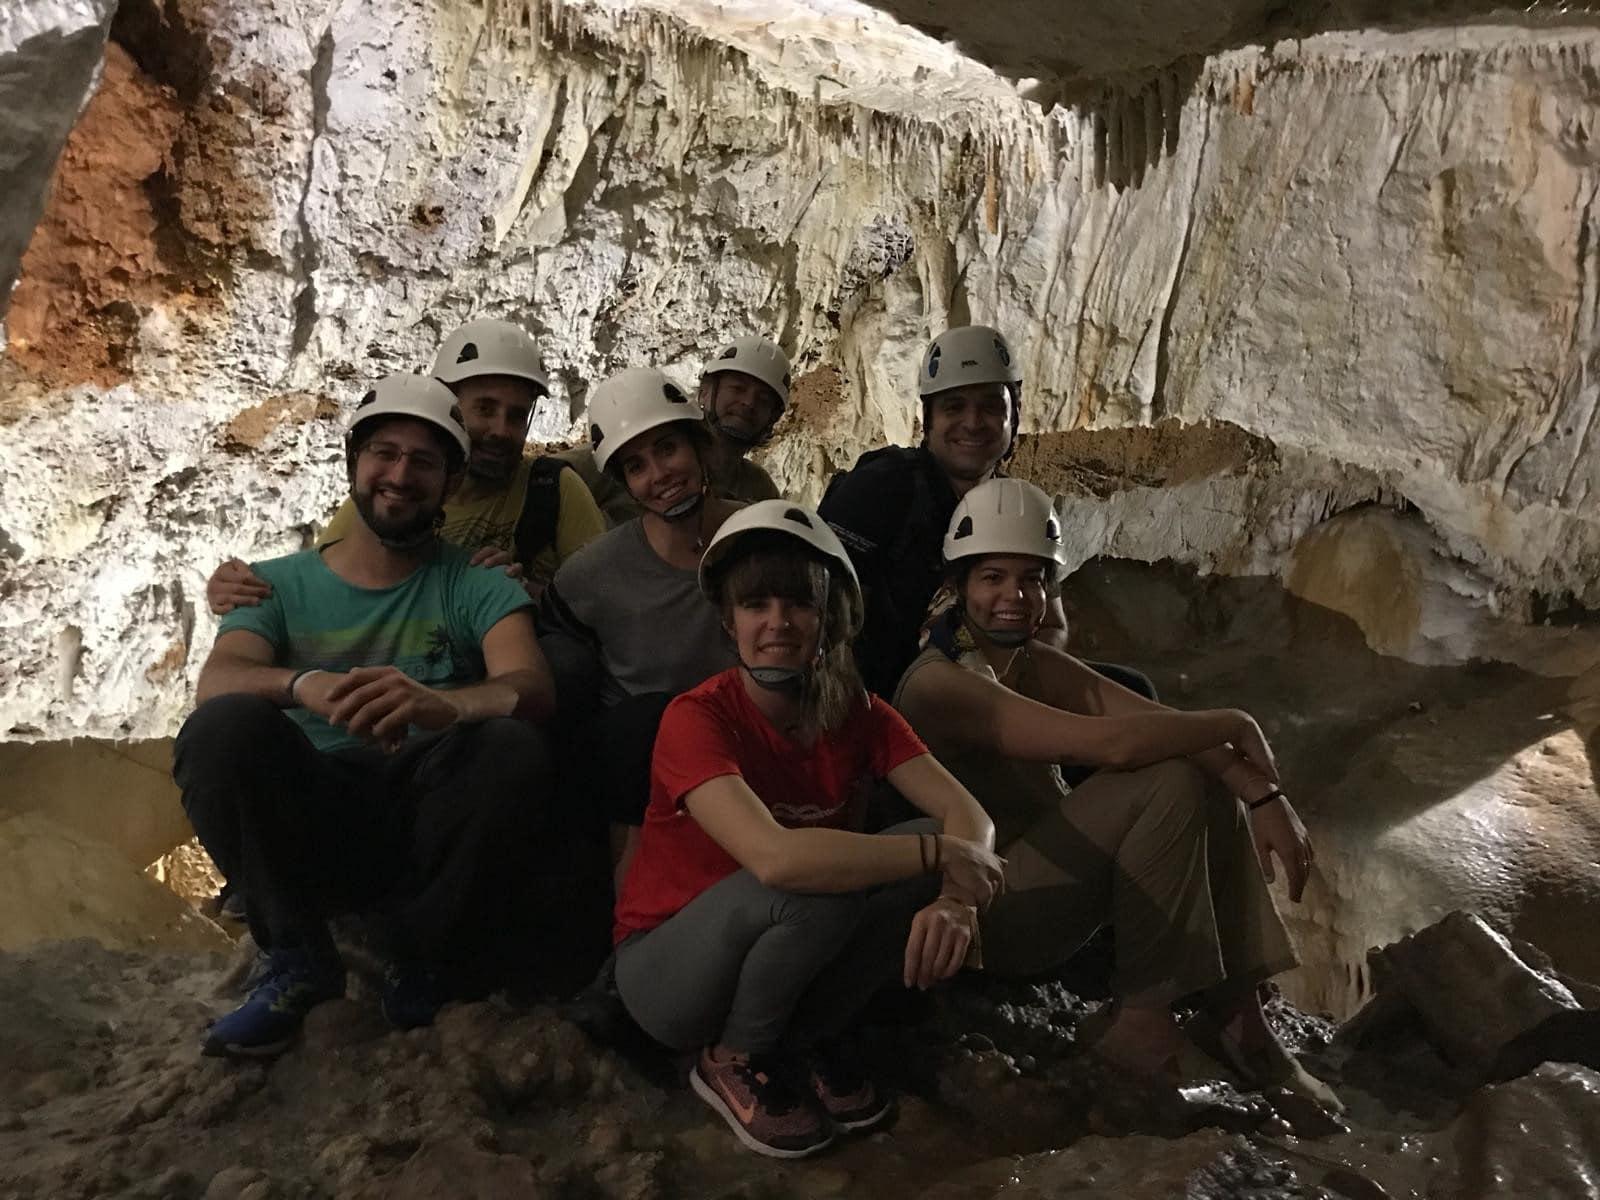 23-jun-2019-blogueros-espaoles-de-viajes-visitan-el-pen_48114555012_o